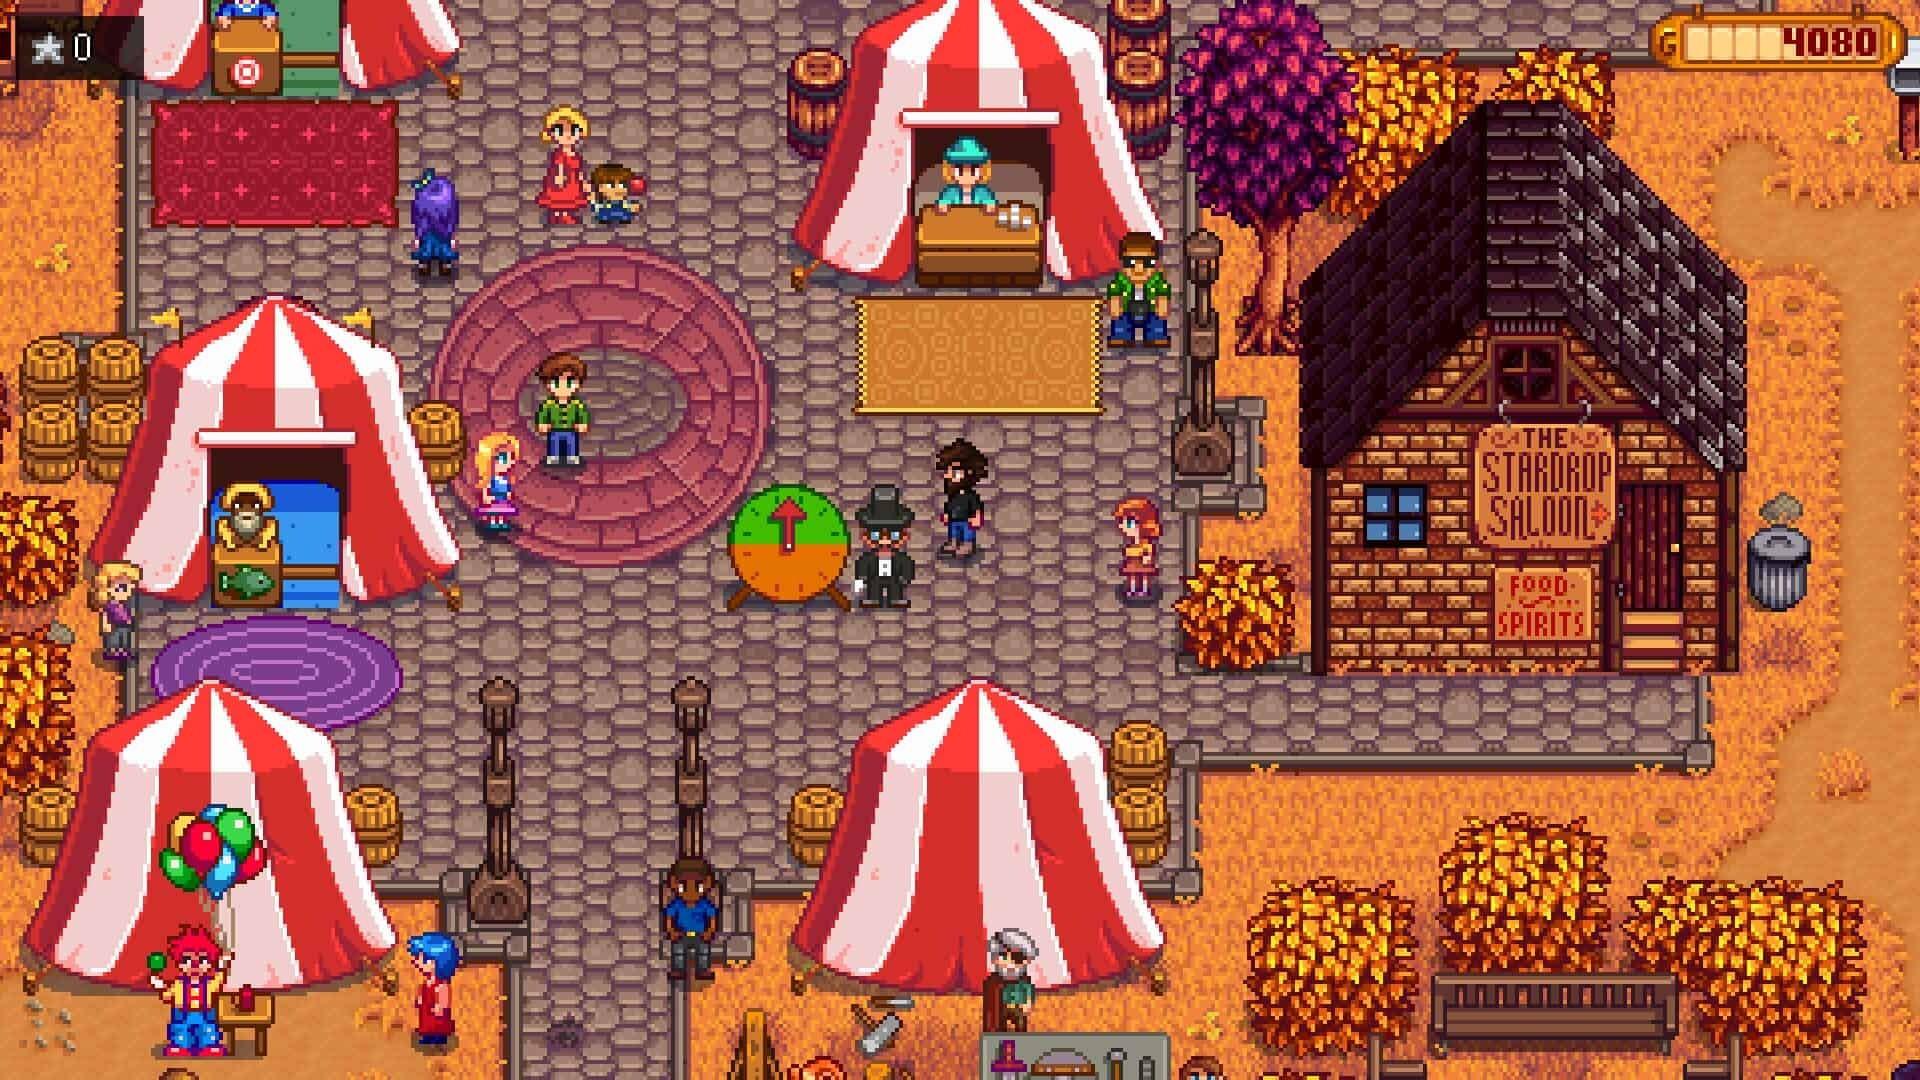 Stardew Valley game screenshot 10